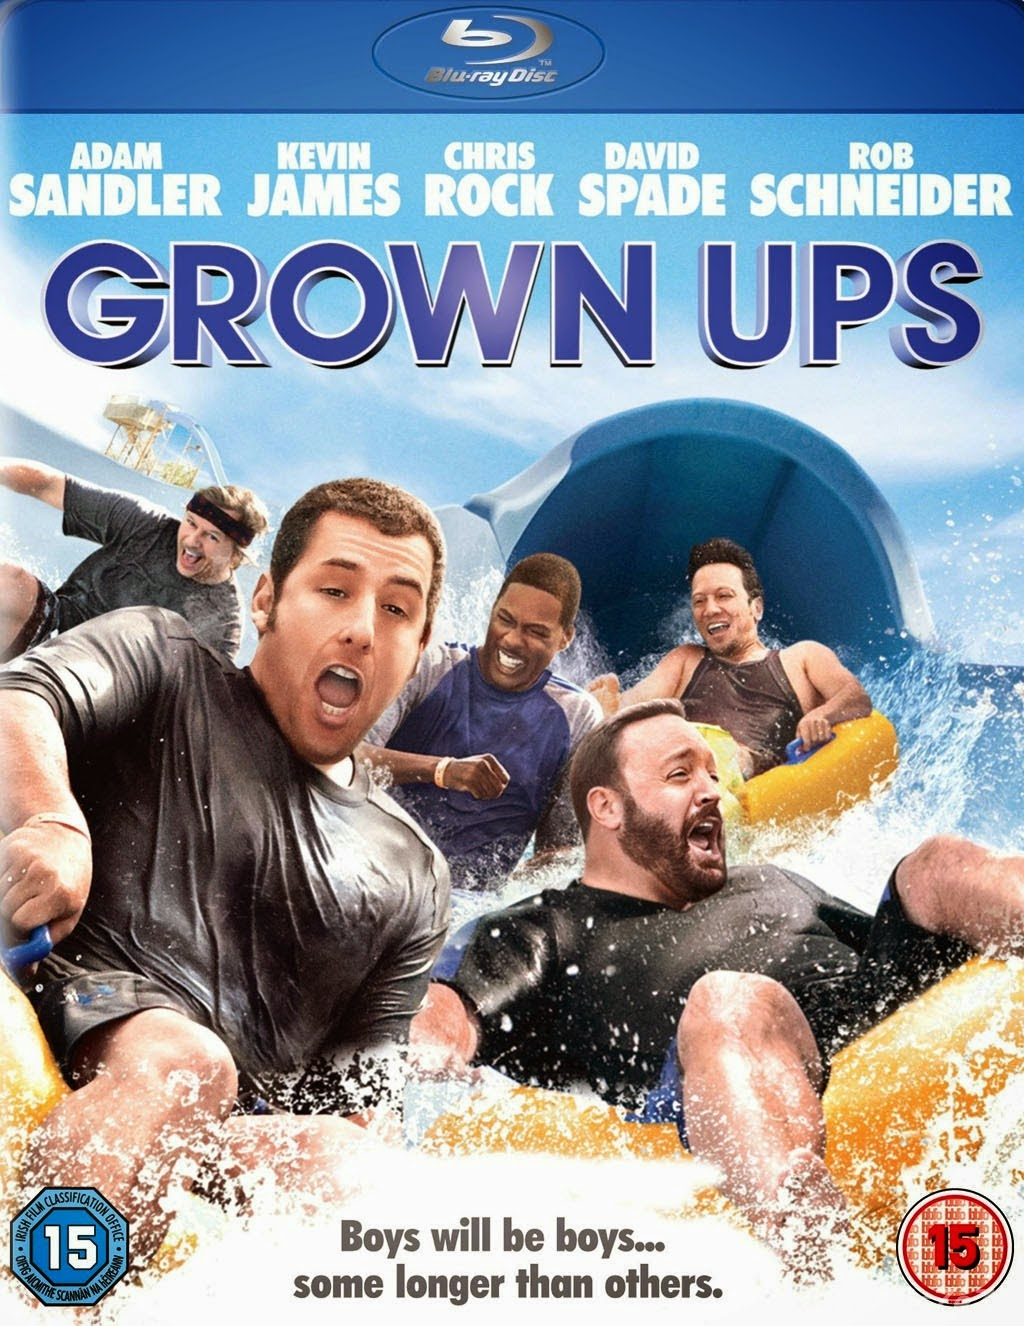 Grown Ups (2010) : ขาใหญ่วัยกลับ